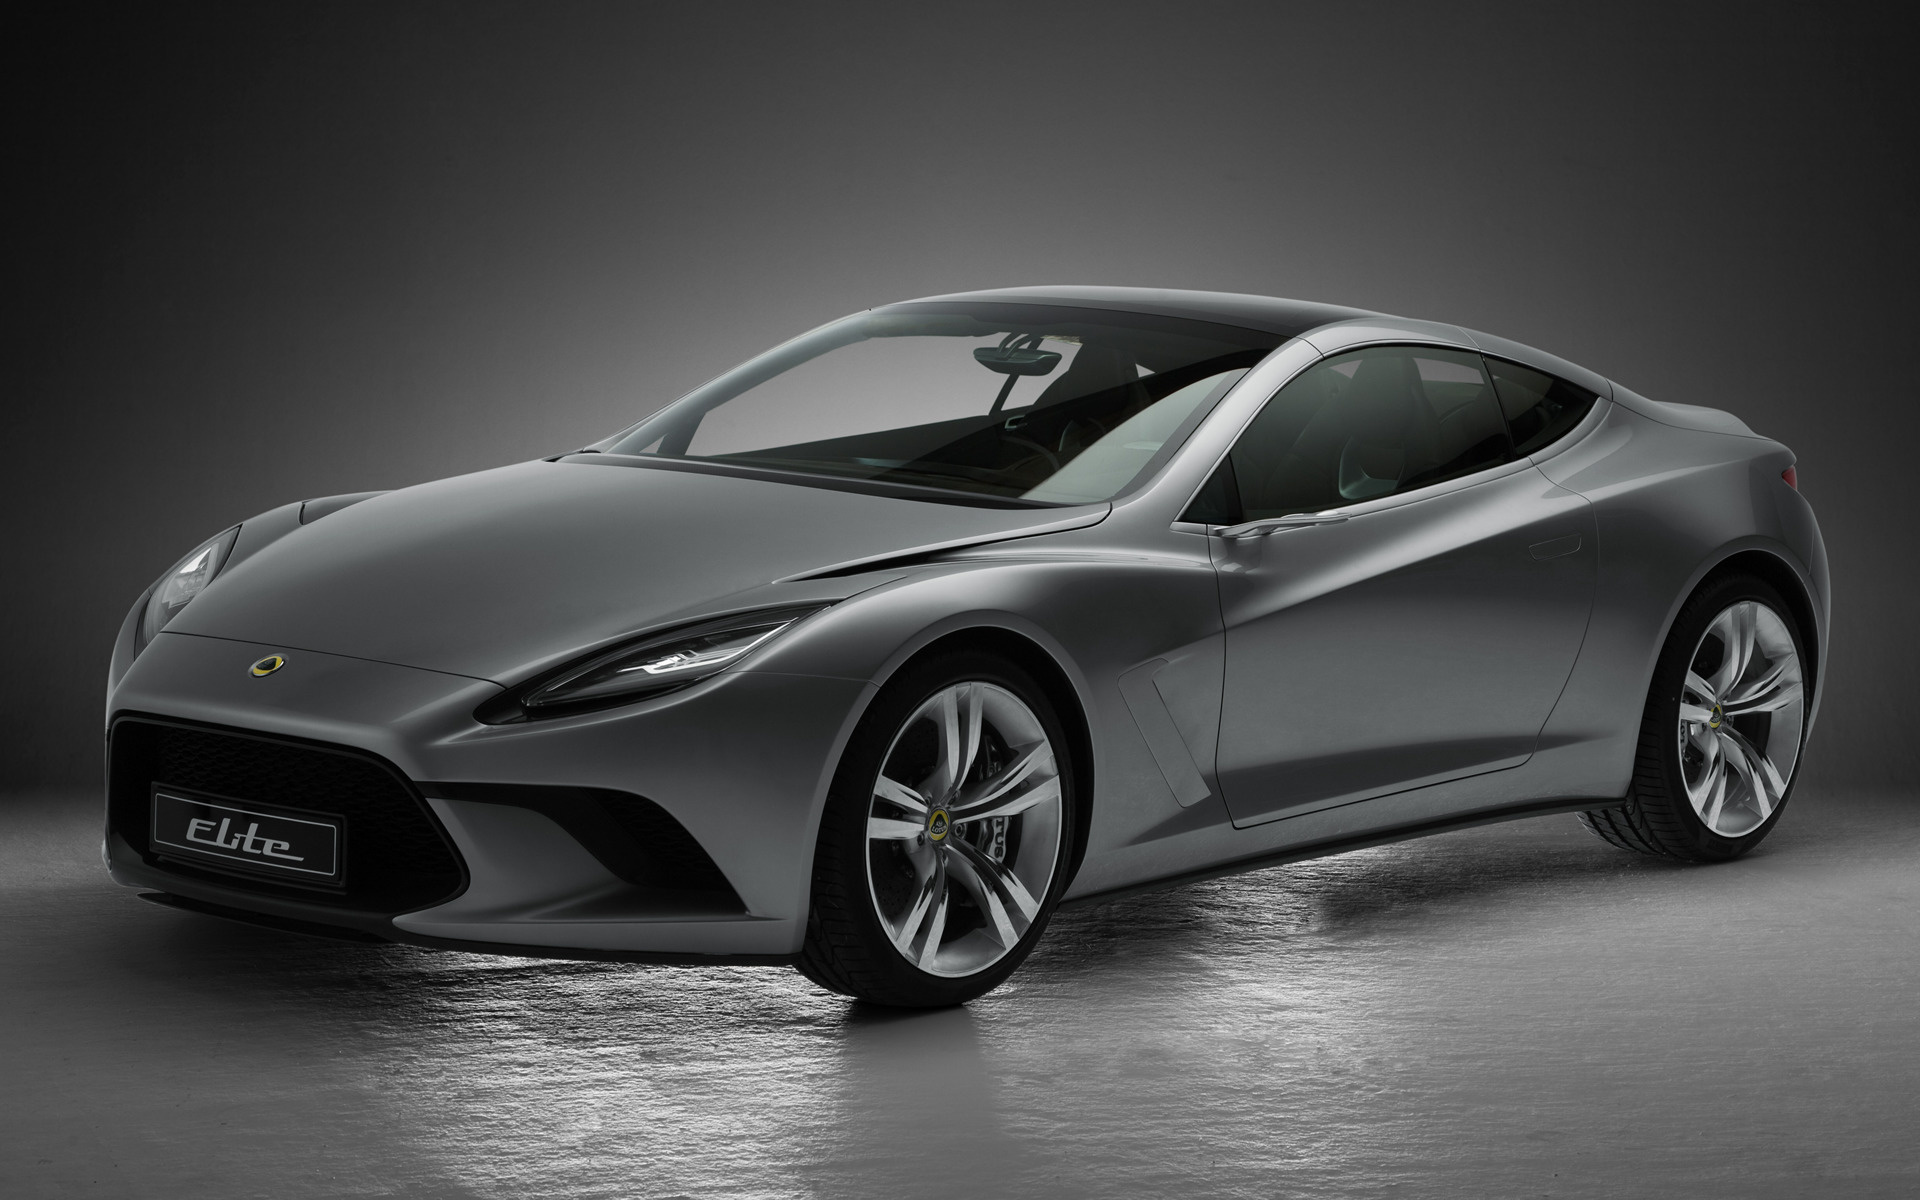 https://www.carpixel.net/w/93274eb268cf426fc6bfd1eaf9104370/lotus-elite-concept-car-wallpaper-41890.jpg